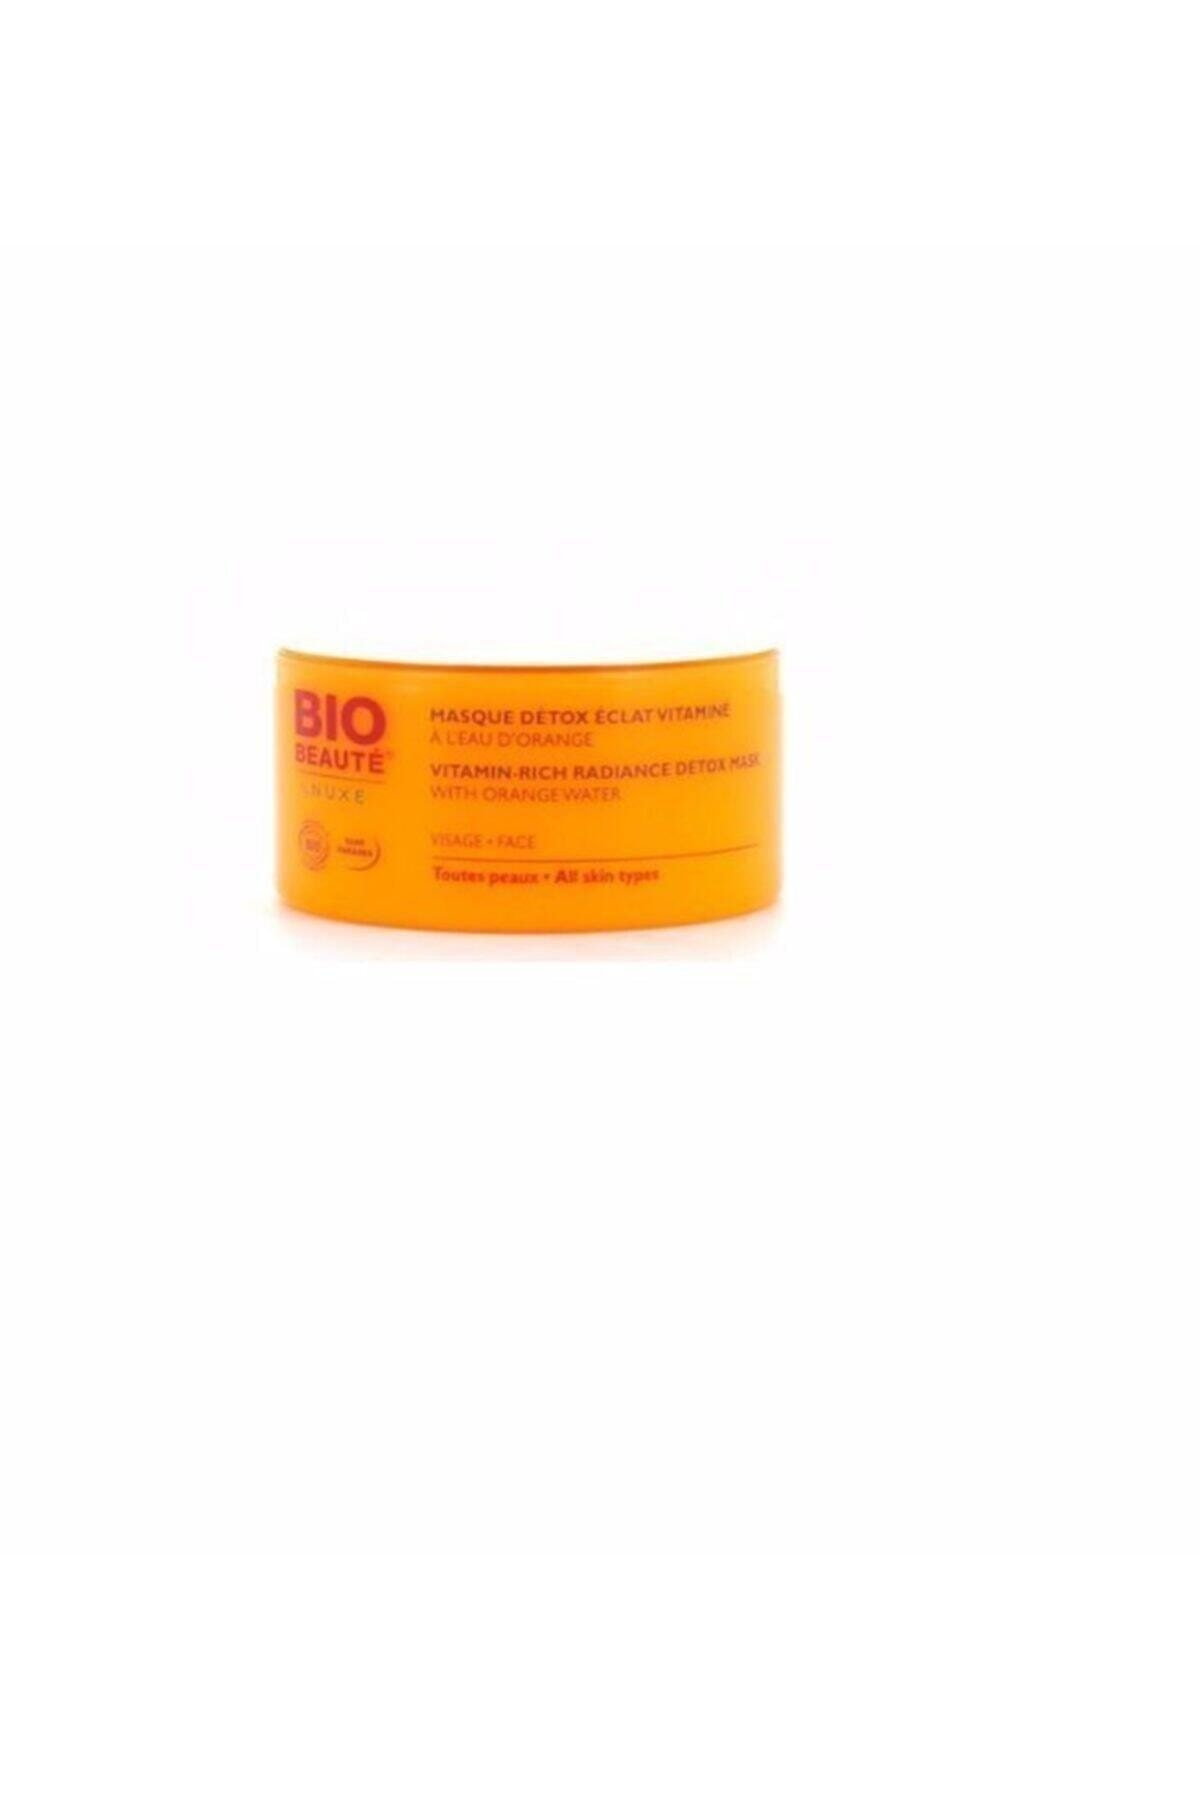 Nuxe Bıo Beaute Işıltılı Detox Vitamin 50ml 1